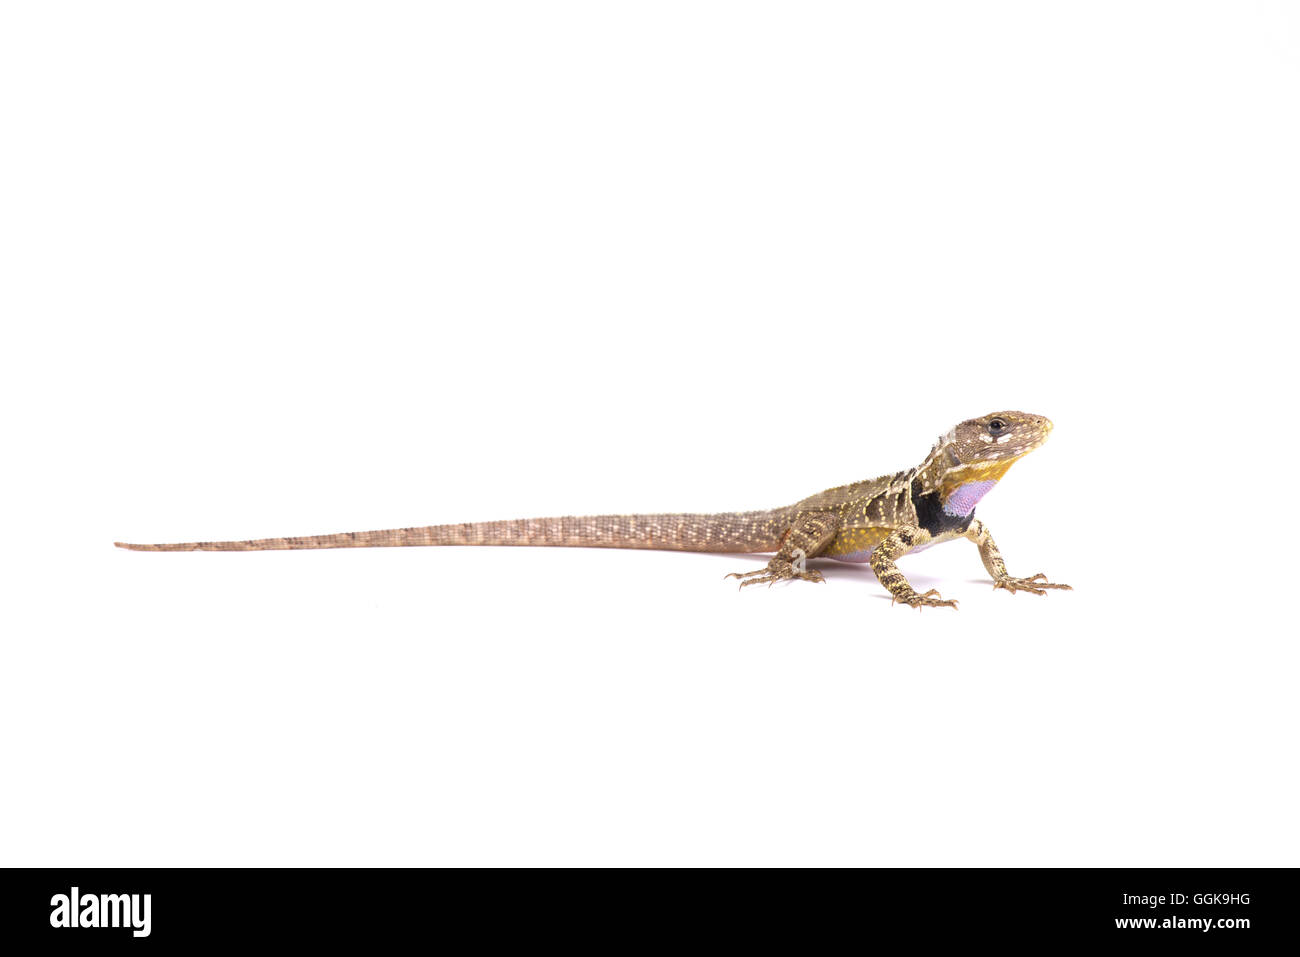 Peruviano throated viola lizard (Stenocercus imitatore) Immagini Stock